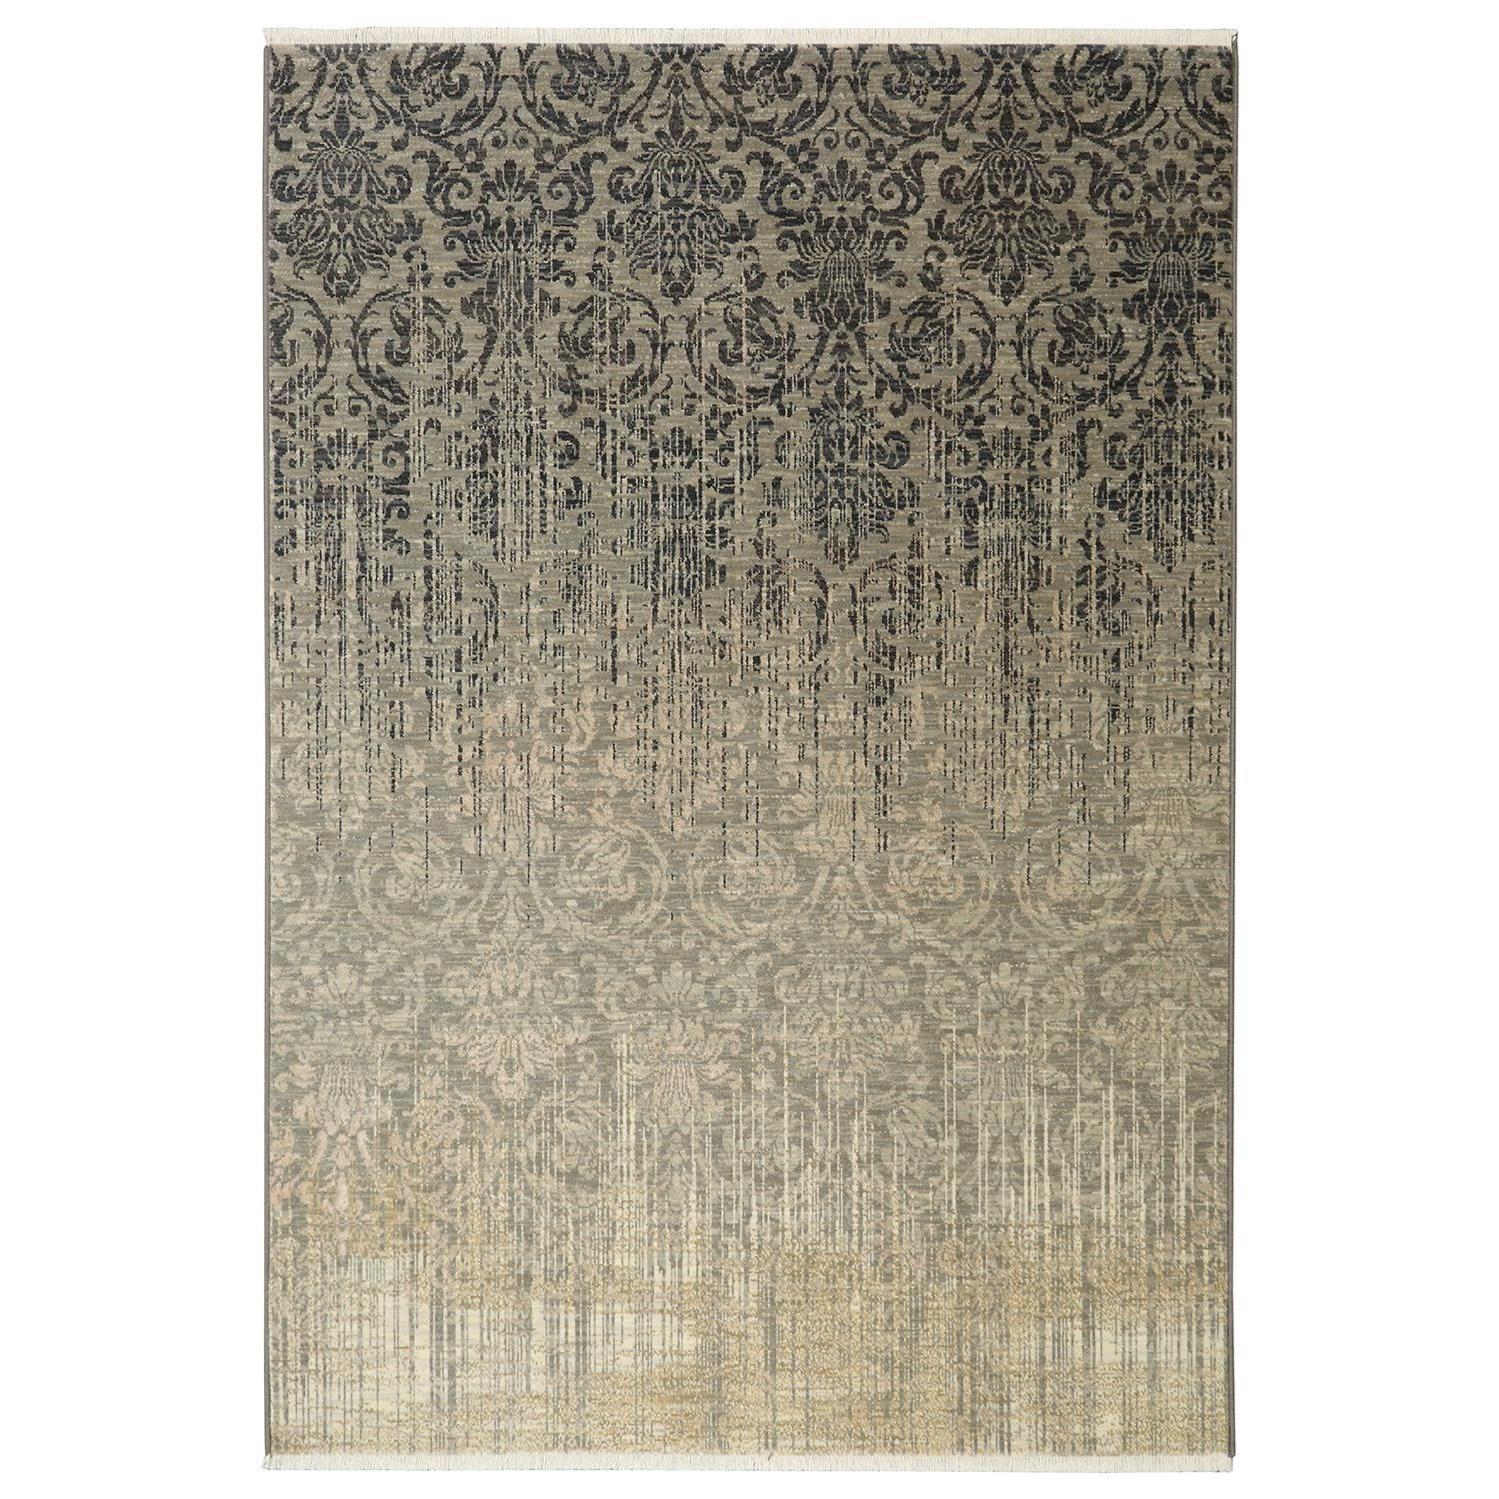 Titanium 9'4x12'9 Tiberio Gray Rug by Karastan Rugs at Darvin Furniture